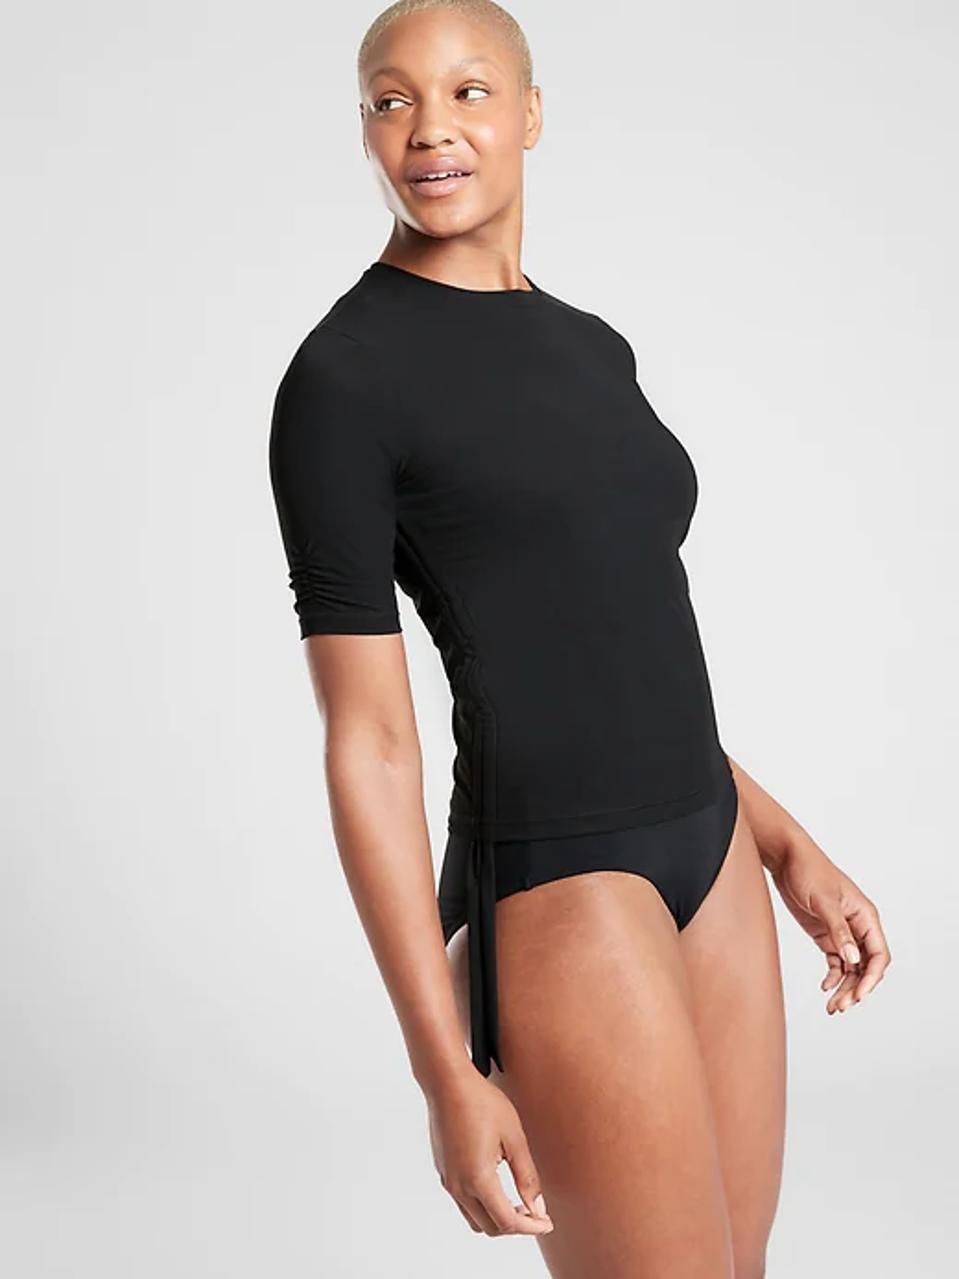 Woman wearing Athleta swimsuit